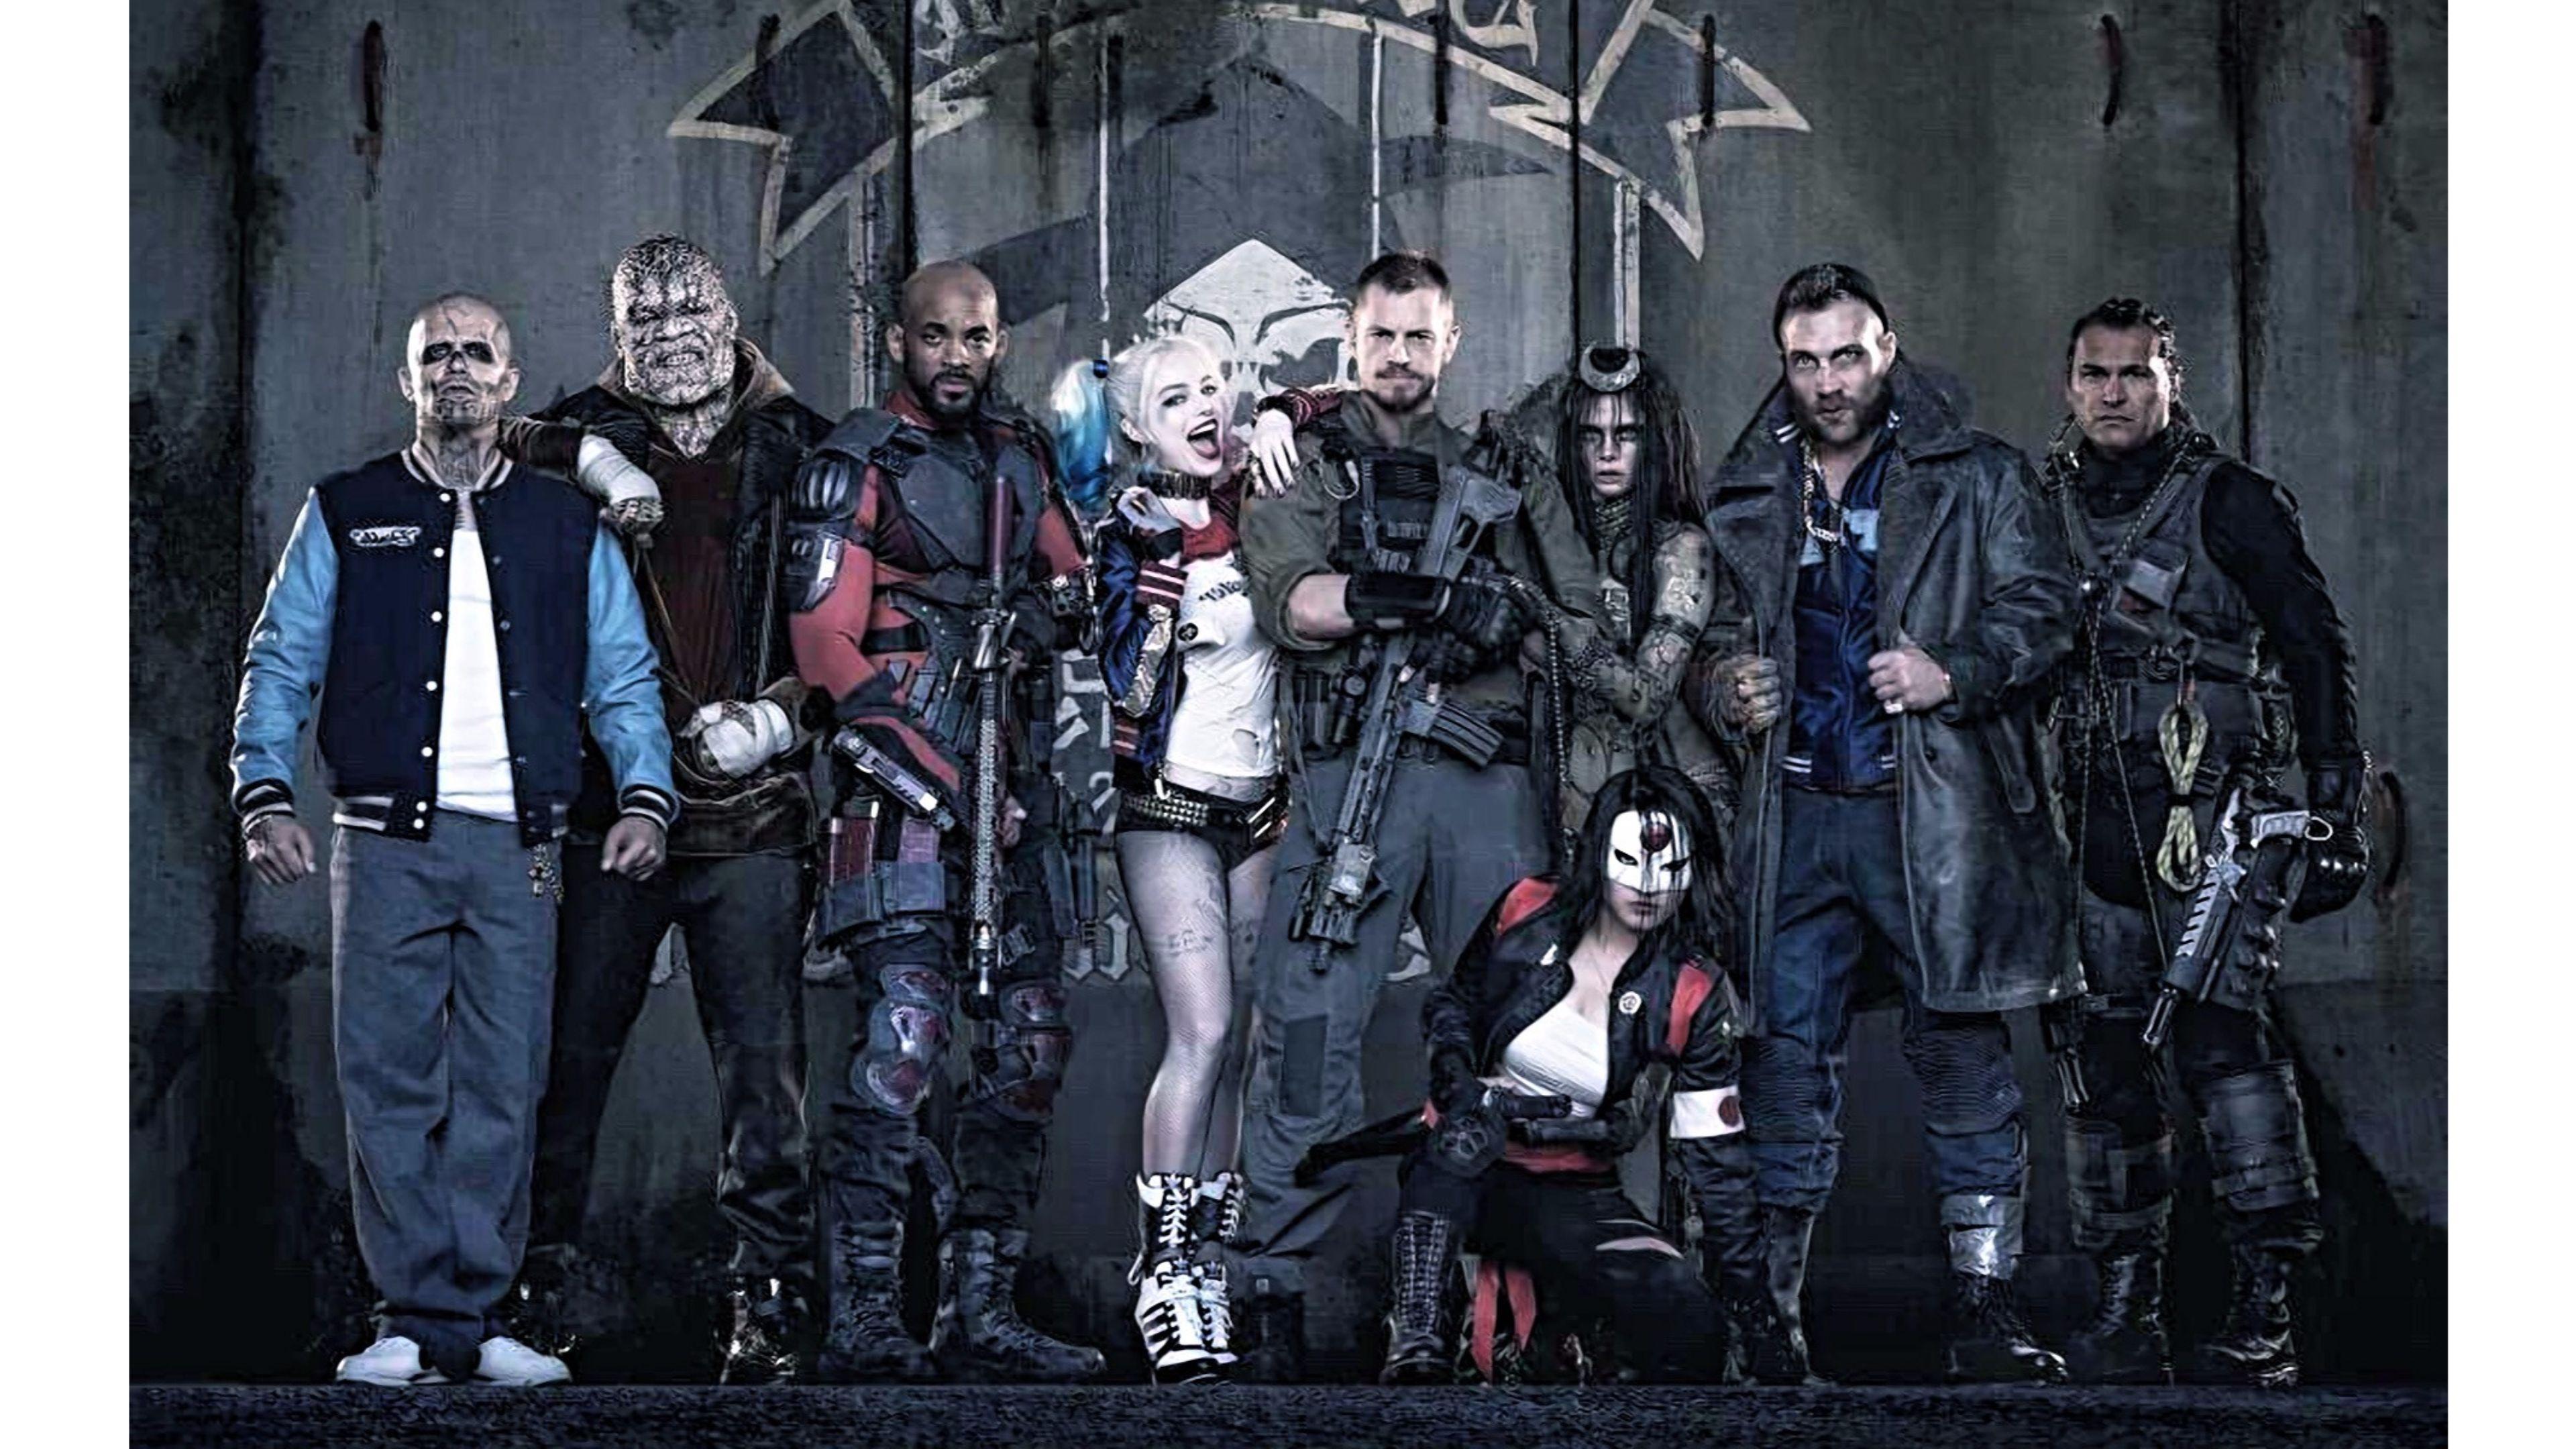 Top Suicide Squad Movie 4k Wallpaper